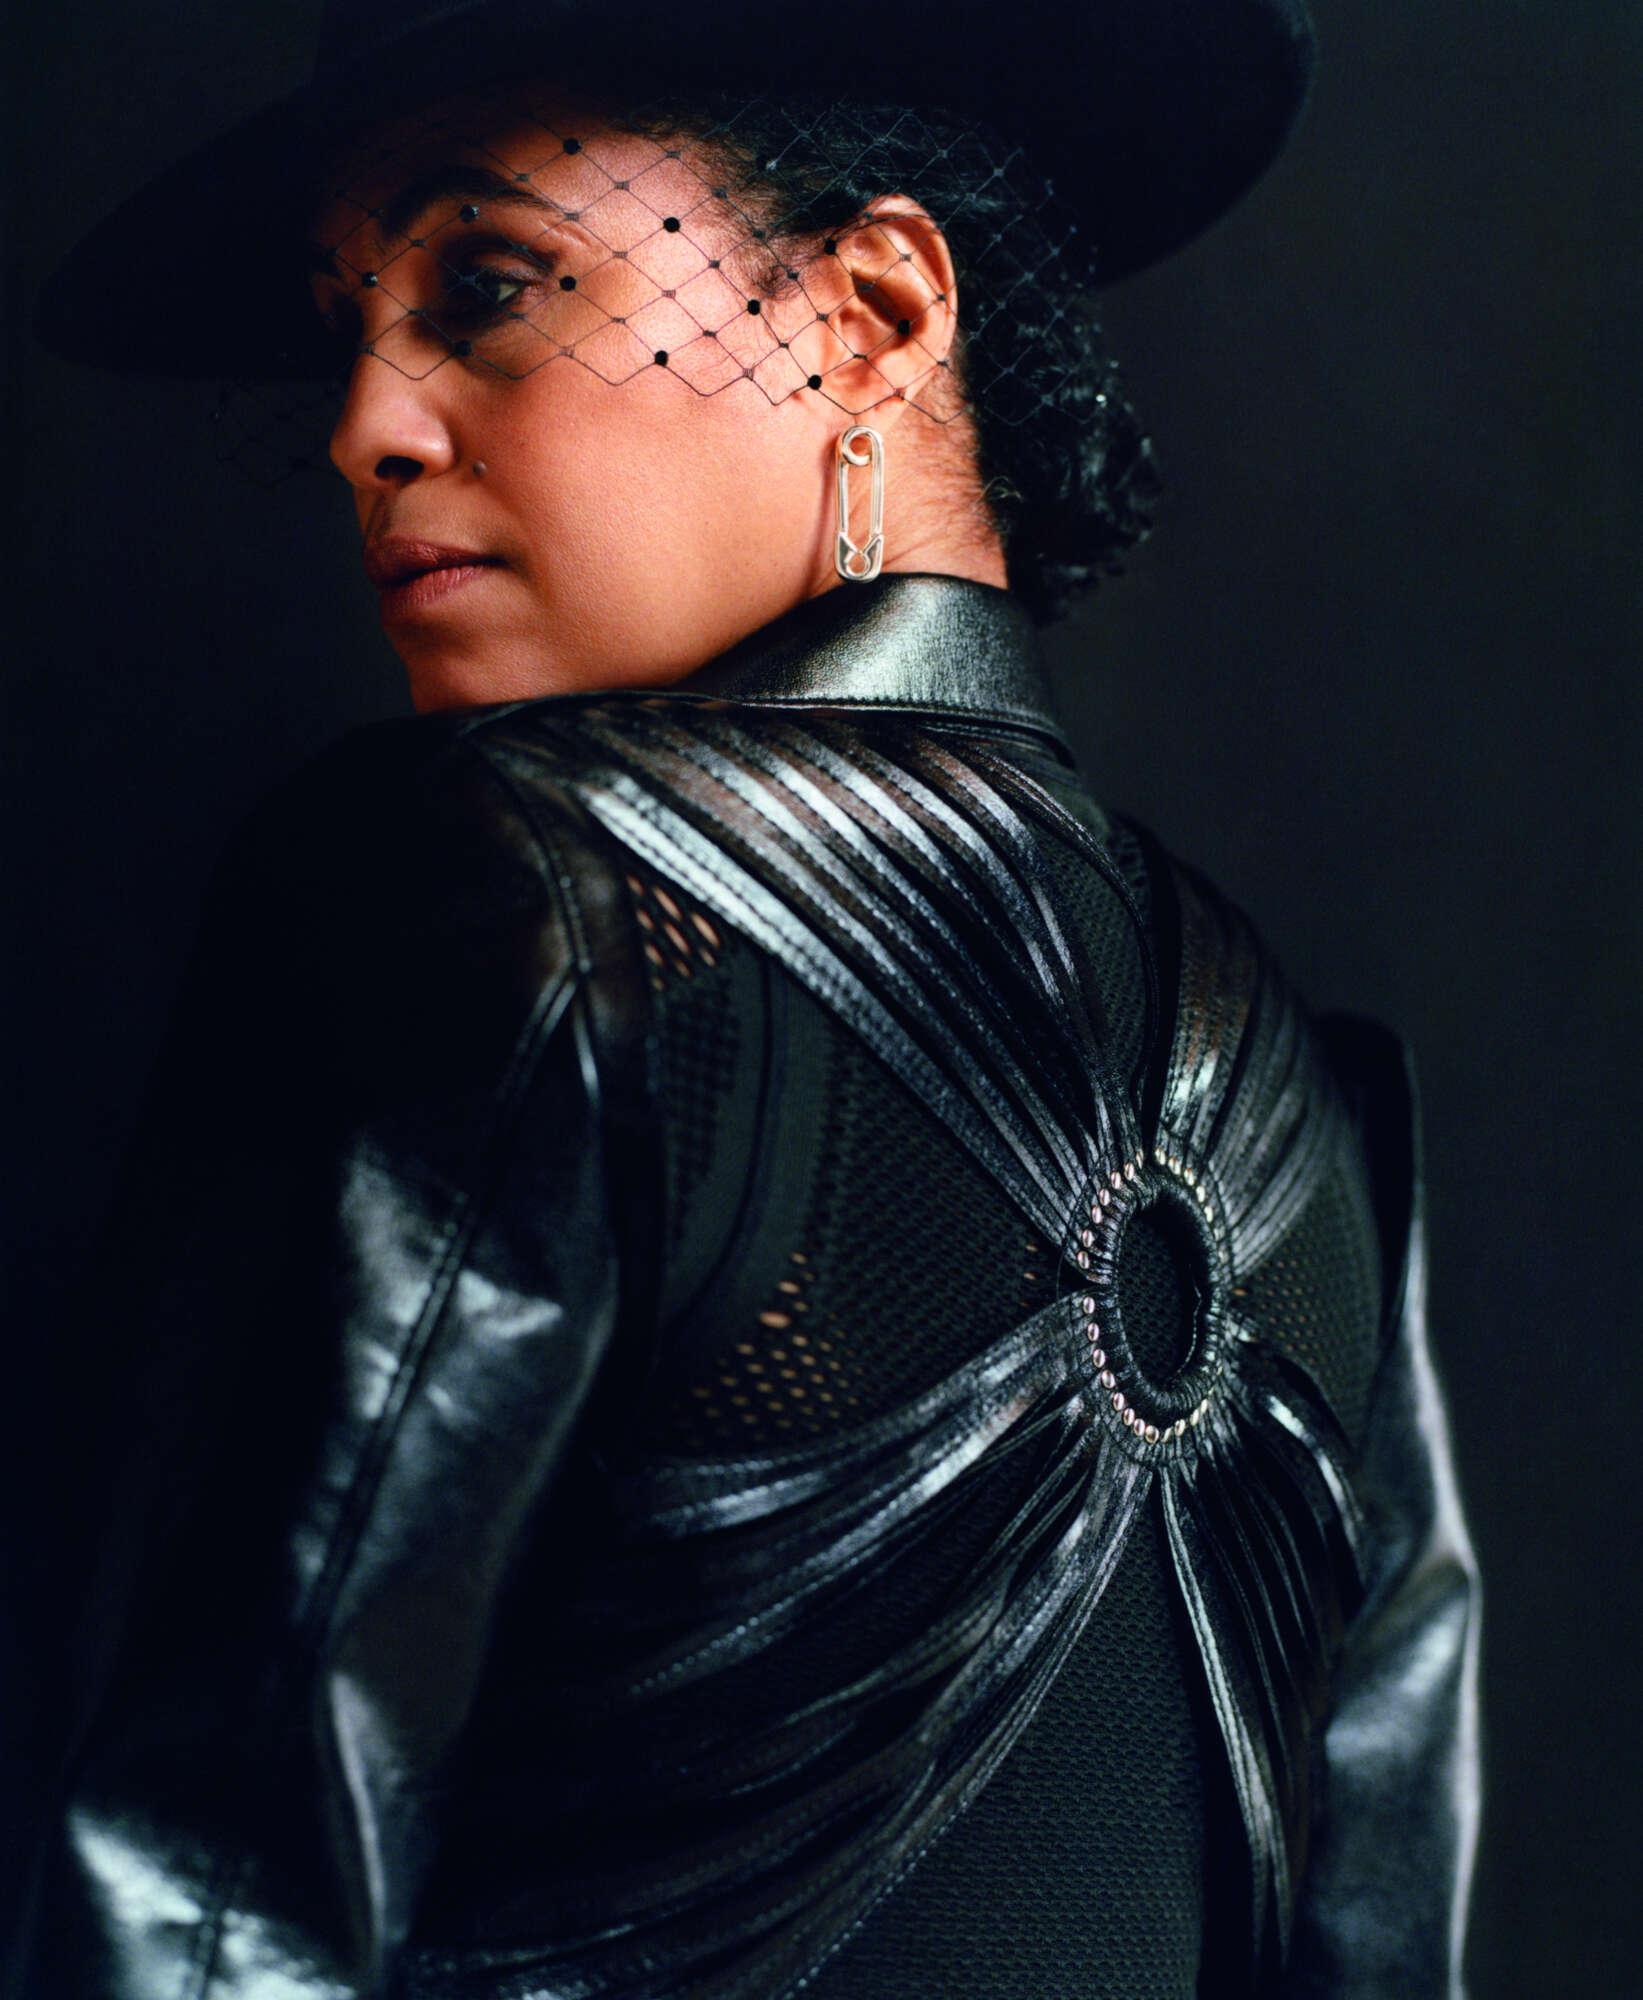 NENEH wears Y3 top, NOIR KEI NINOMIYA jacket from MACHINE-A, PHILIP TREACY hat.